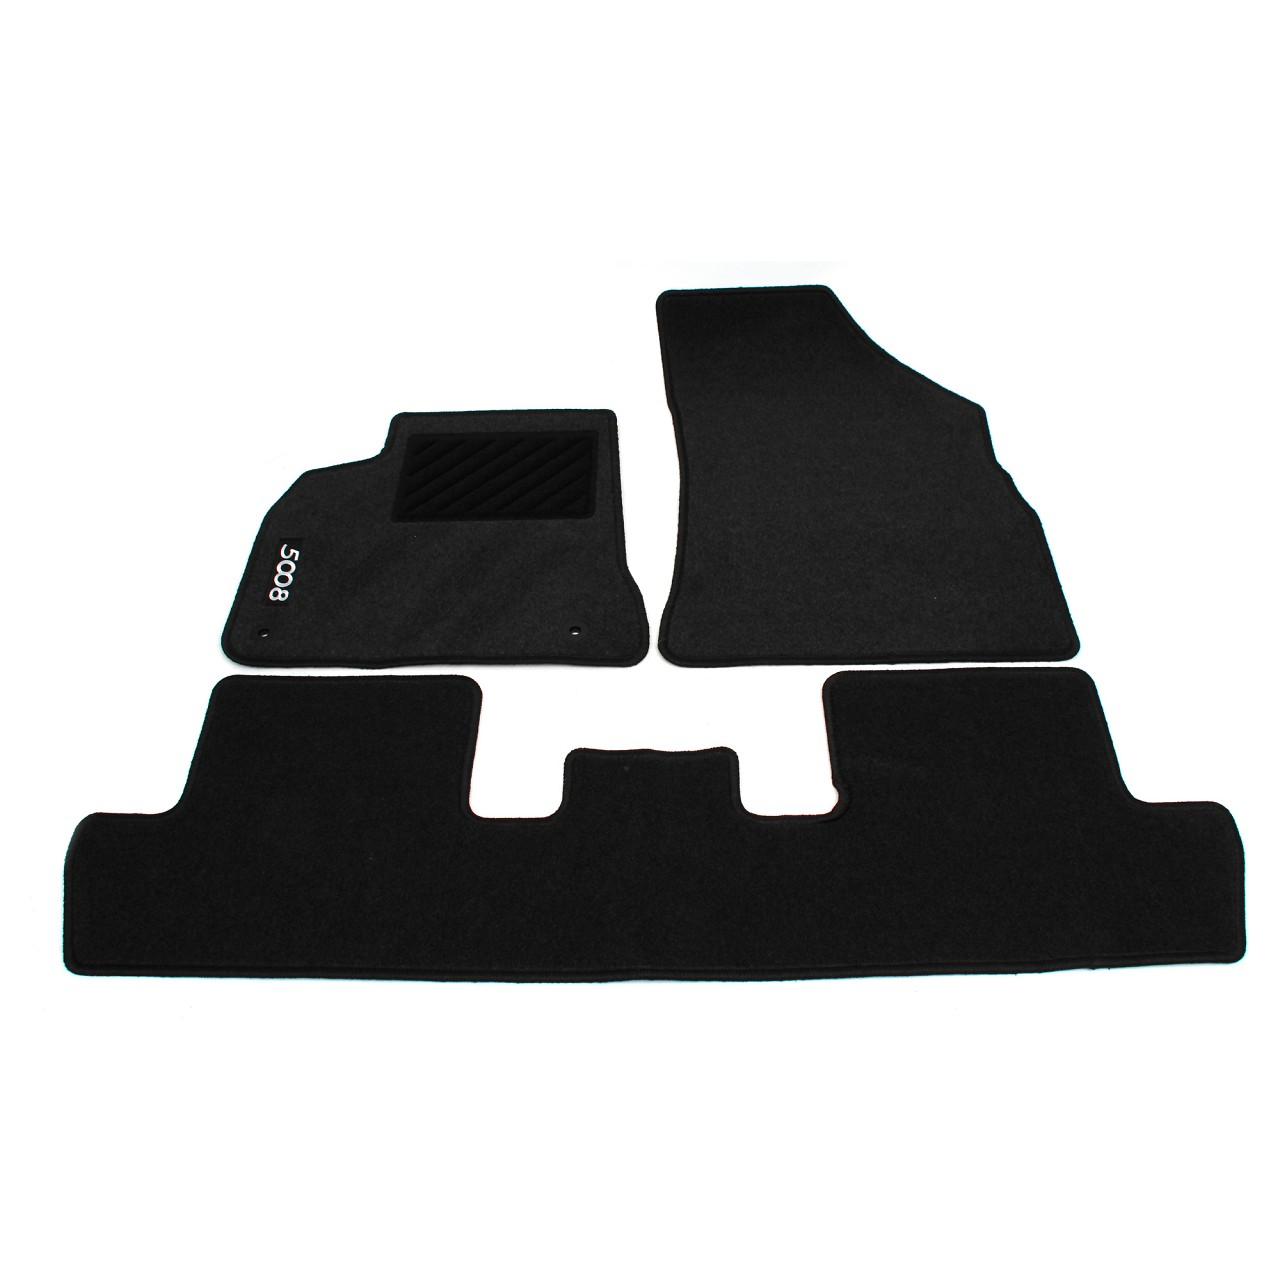 ORIGINAL Peugeot Textilmatten Fußmatten Automatten Satz 5008 3-teilig 9663.J0